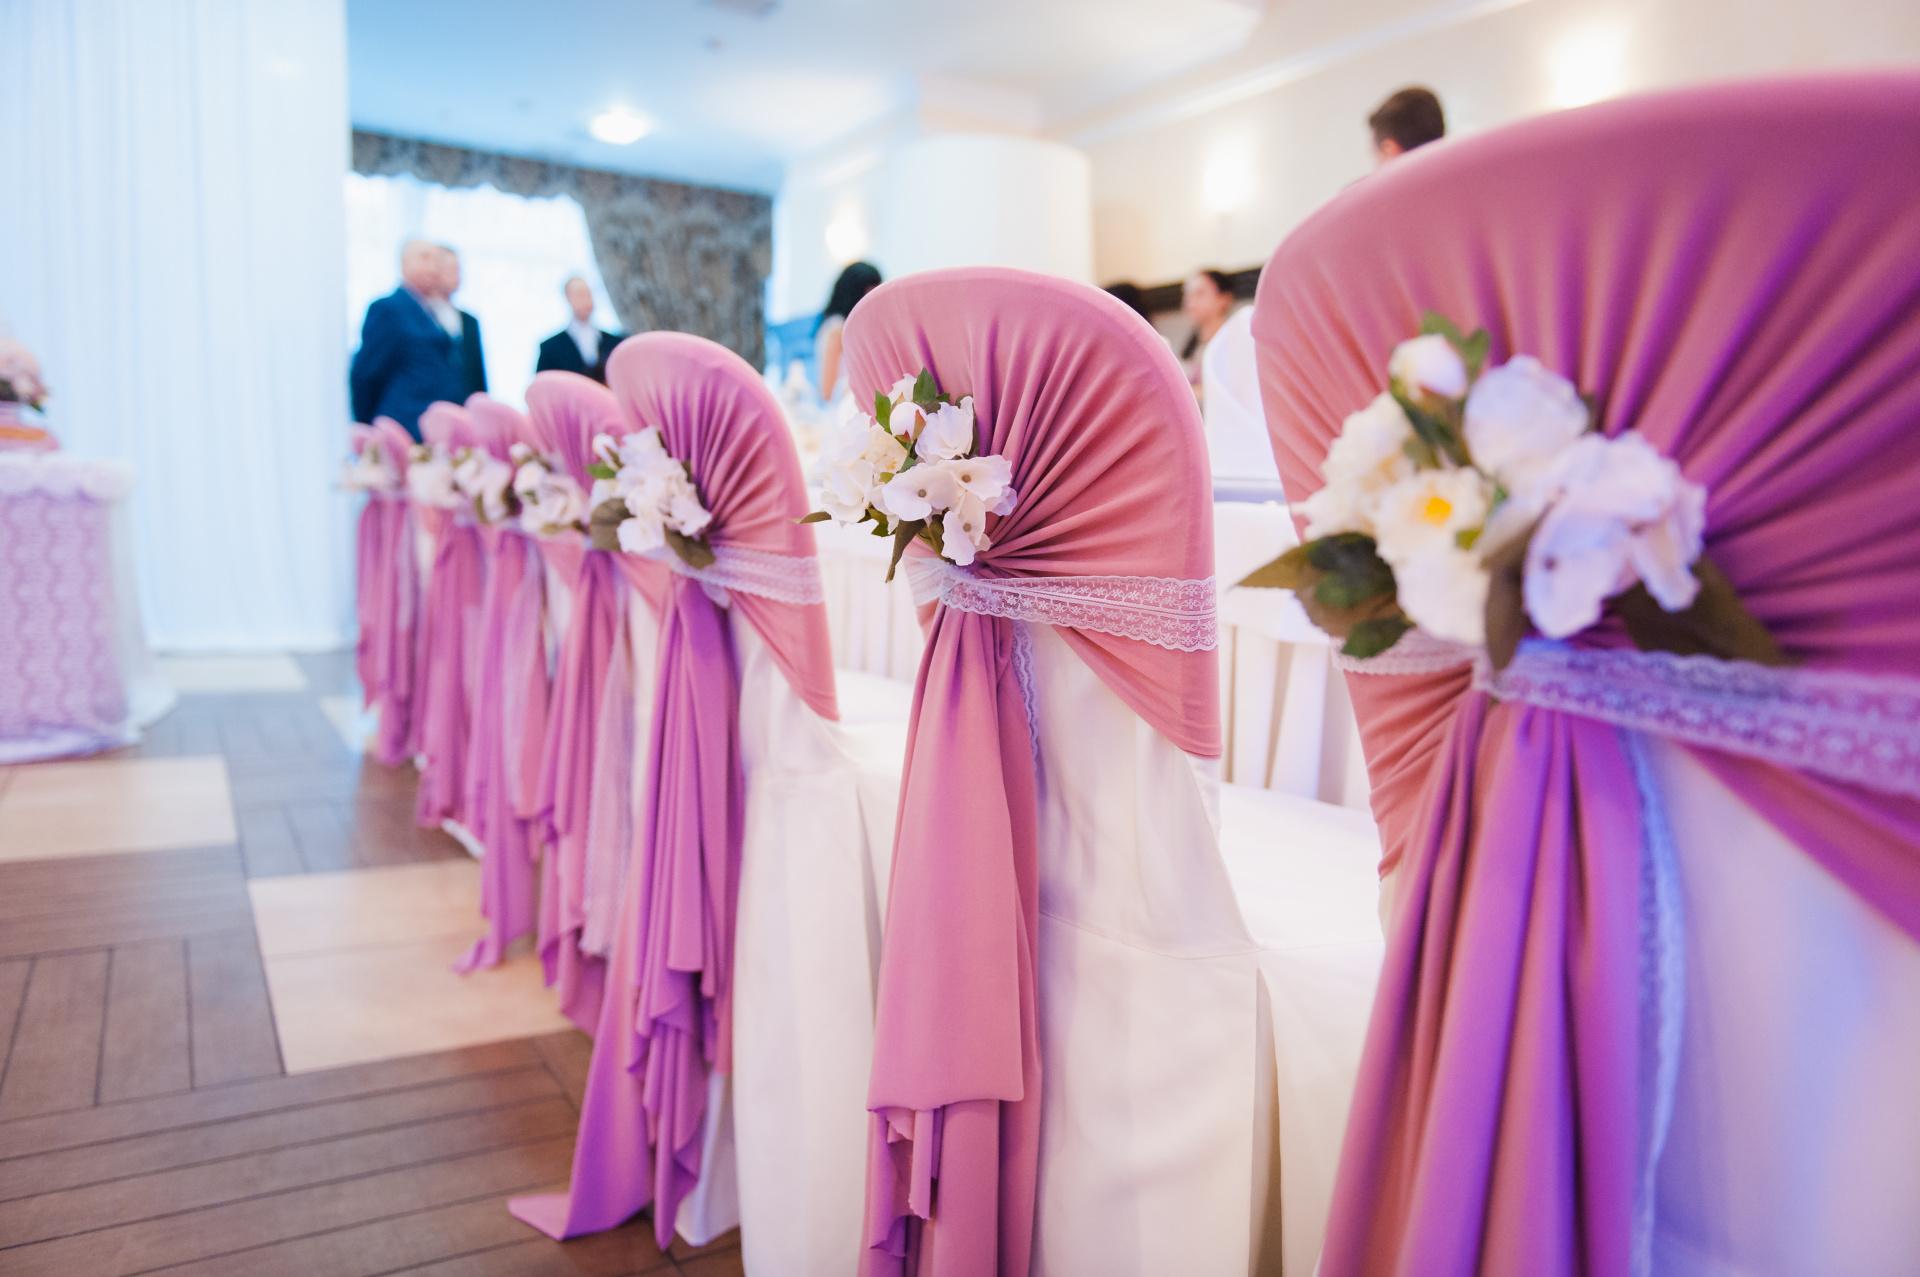 raspberry pink wedding, raspberry wedding chair hood cover sash, pink wedding, raspberry wedding, chair sash, chair hood, chair cover